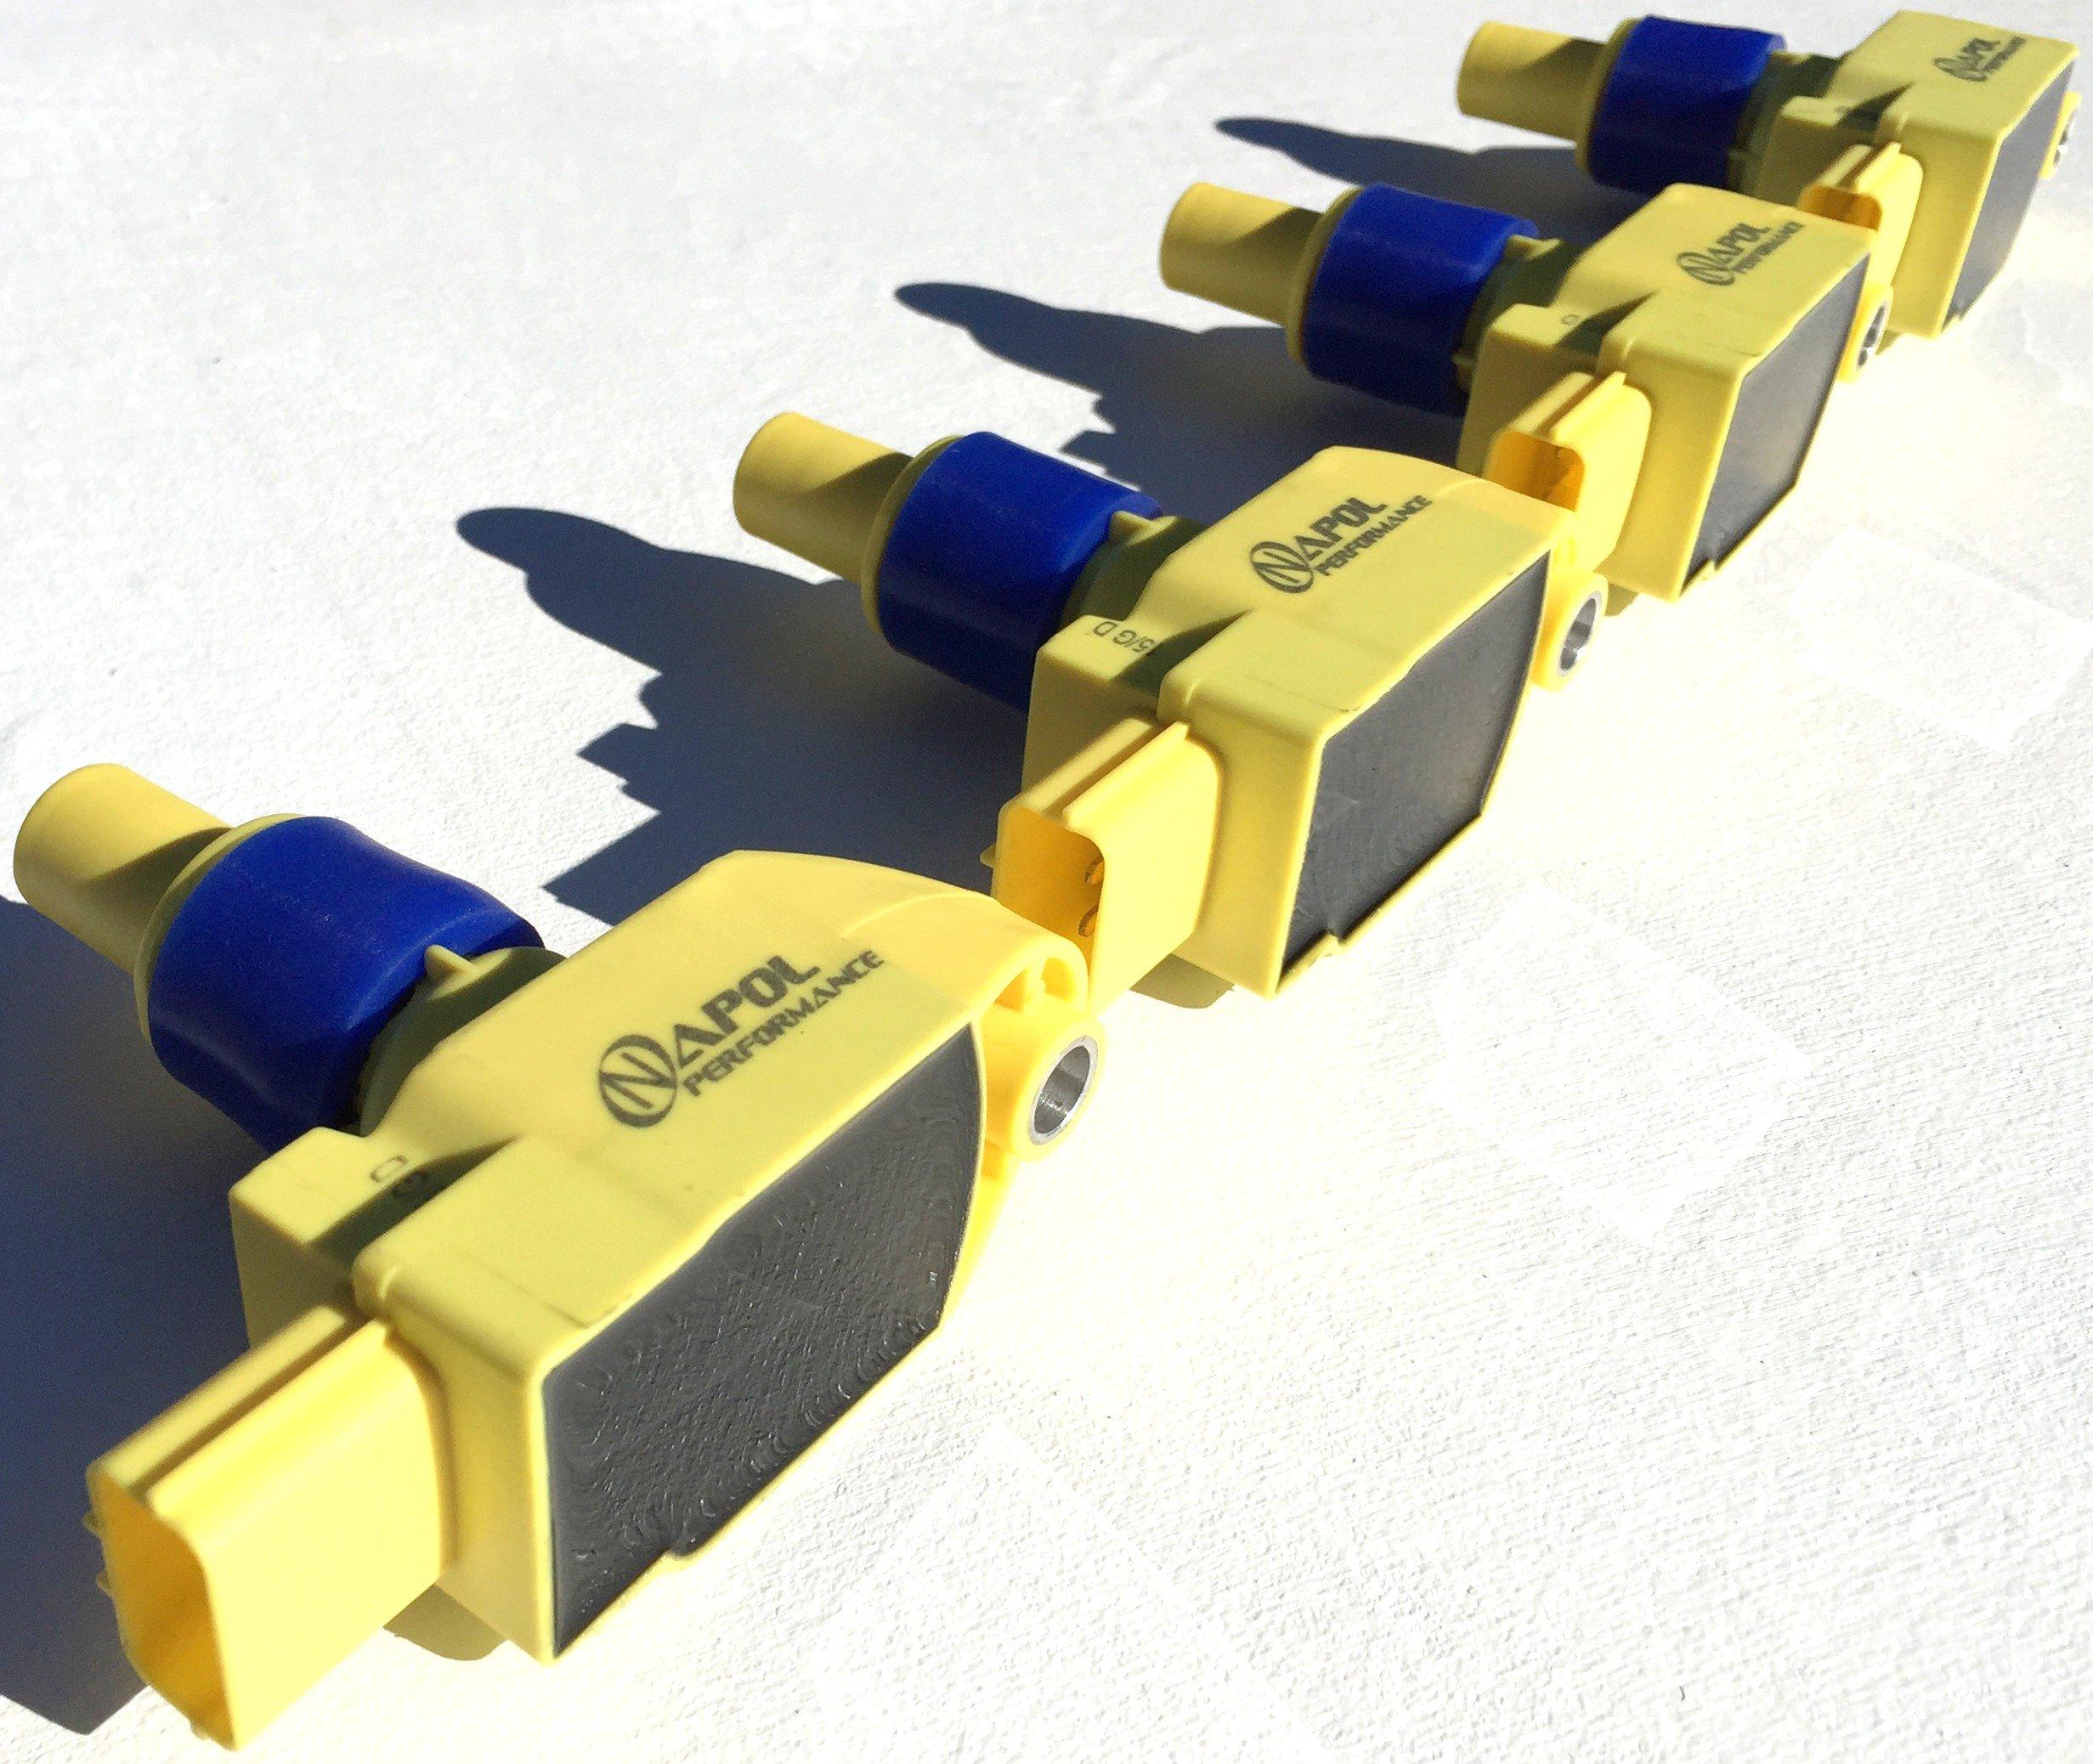 N3H118100B9U UF501 Set of 4 Ignition Coil for Mazda RX8 2004-2011 fits UF-501